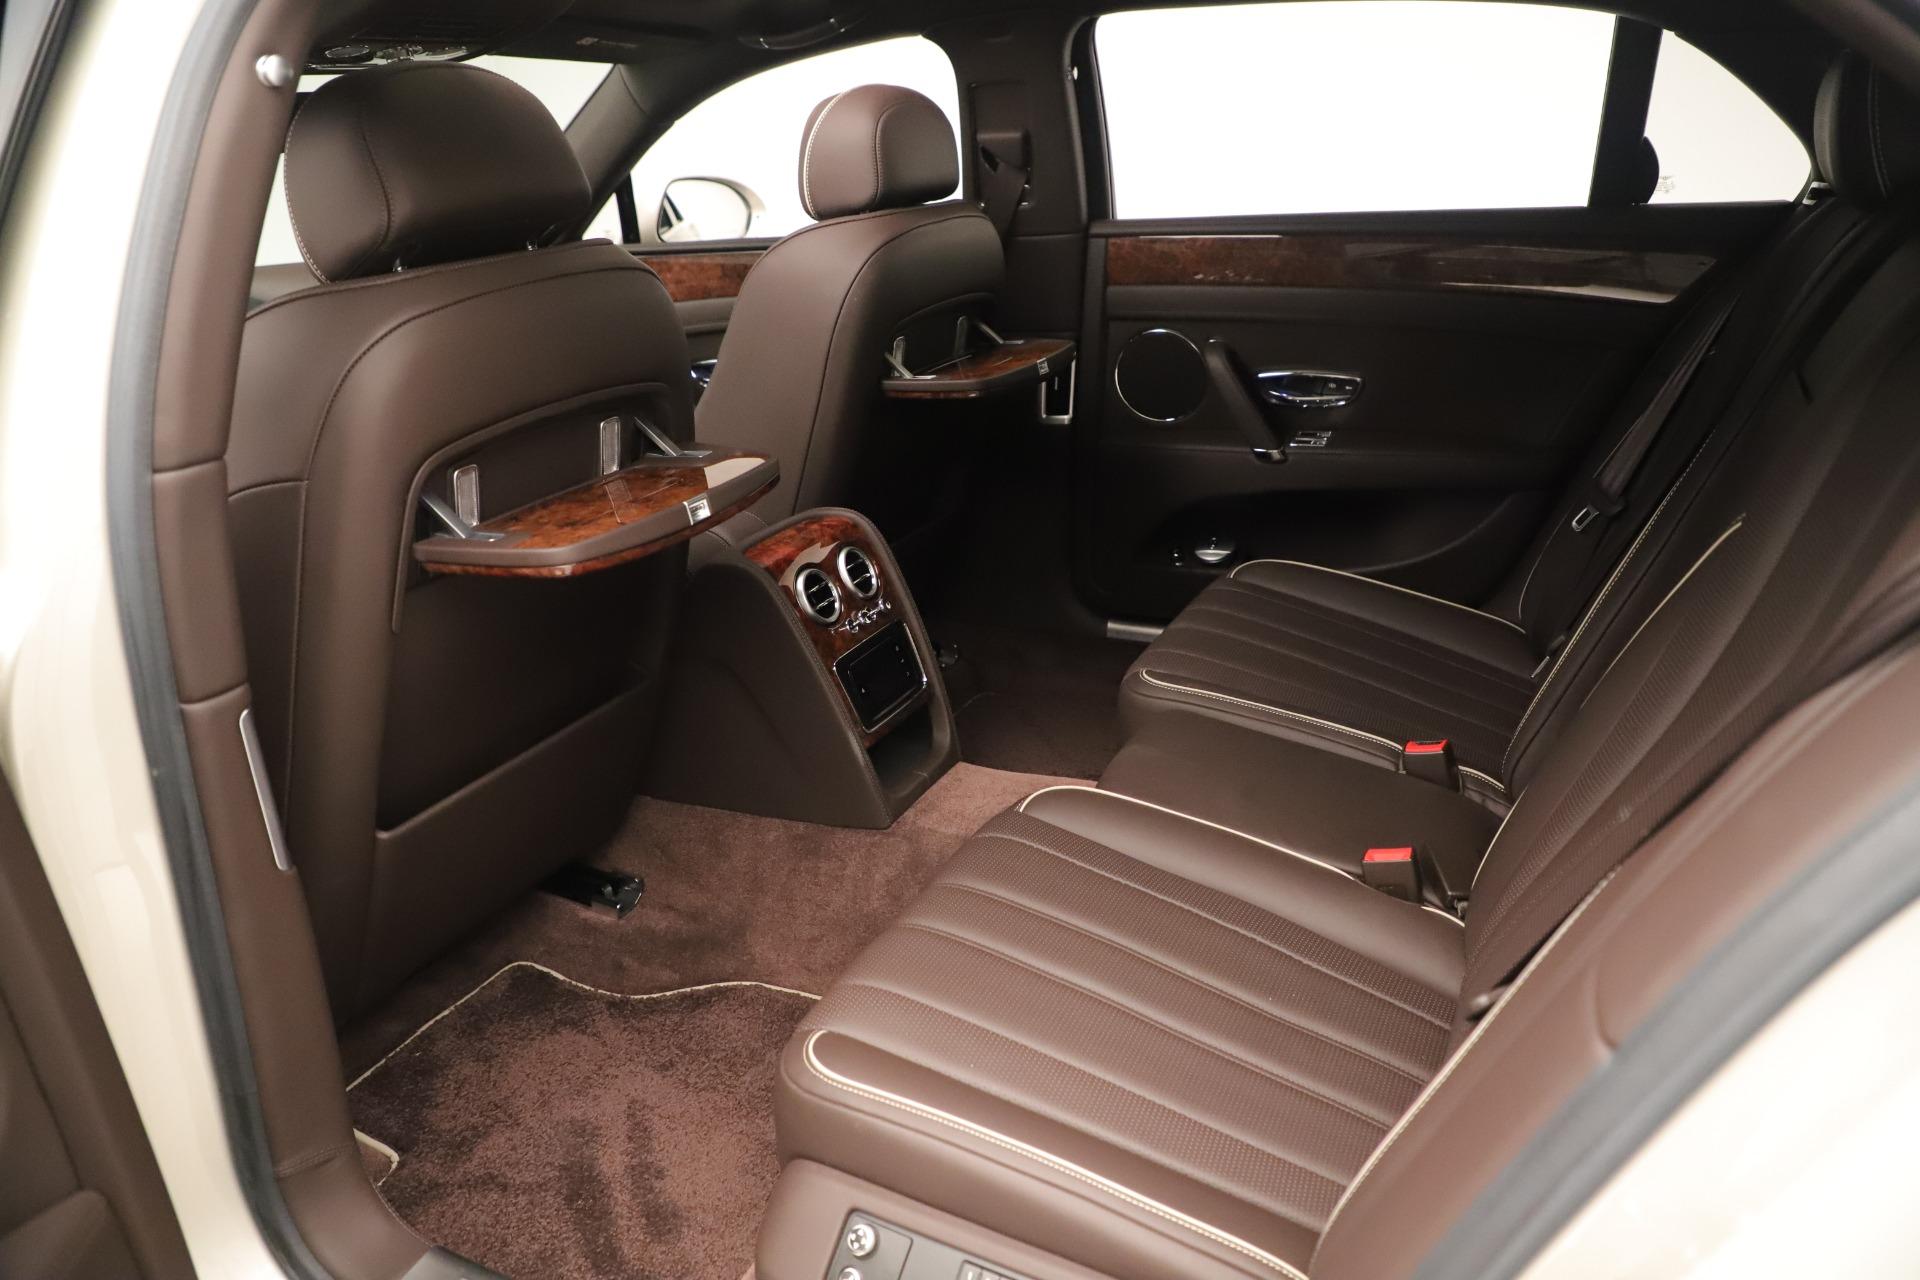 Used 2015 Bentley Flying Spur V8 For Sale In Westport, CT 3444_p20